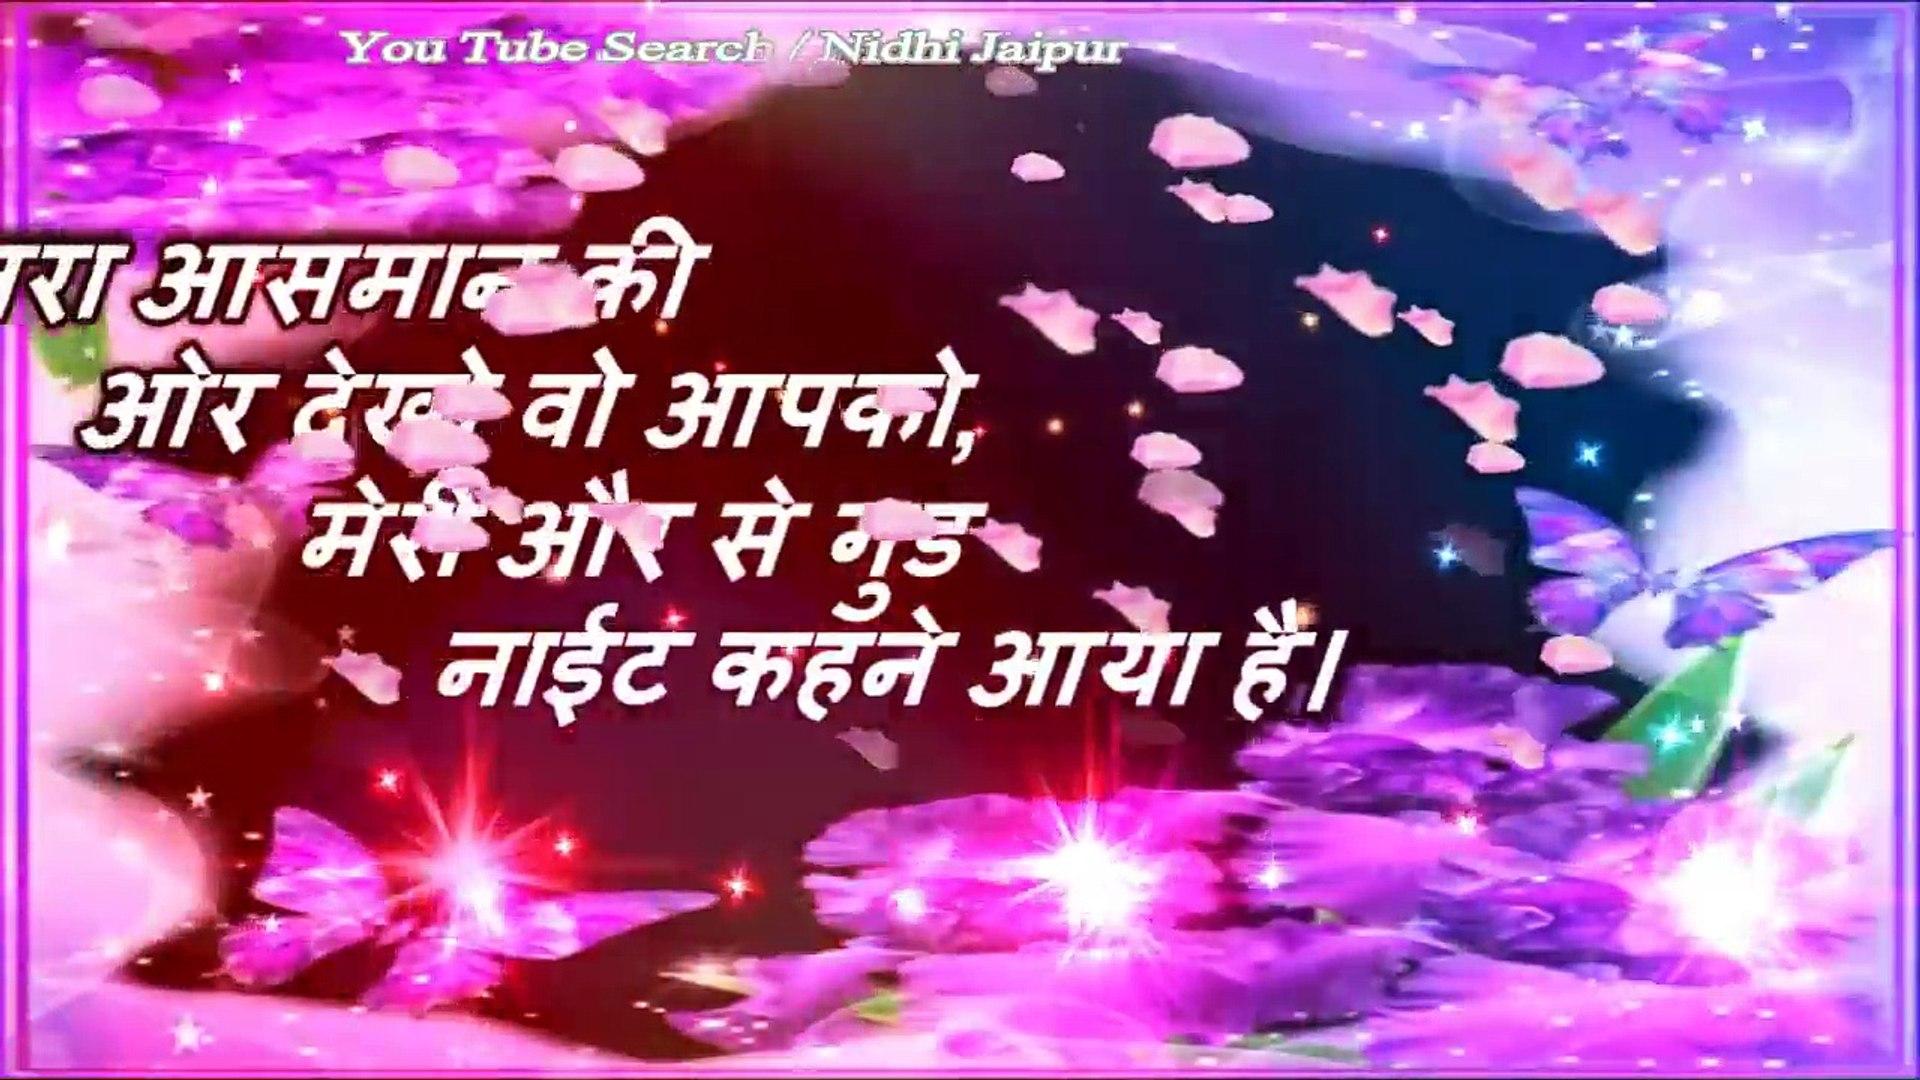 Good Night Video - Whatsapp   Sweet Dreams Good Night  Video   Greetings  Quotes   Status